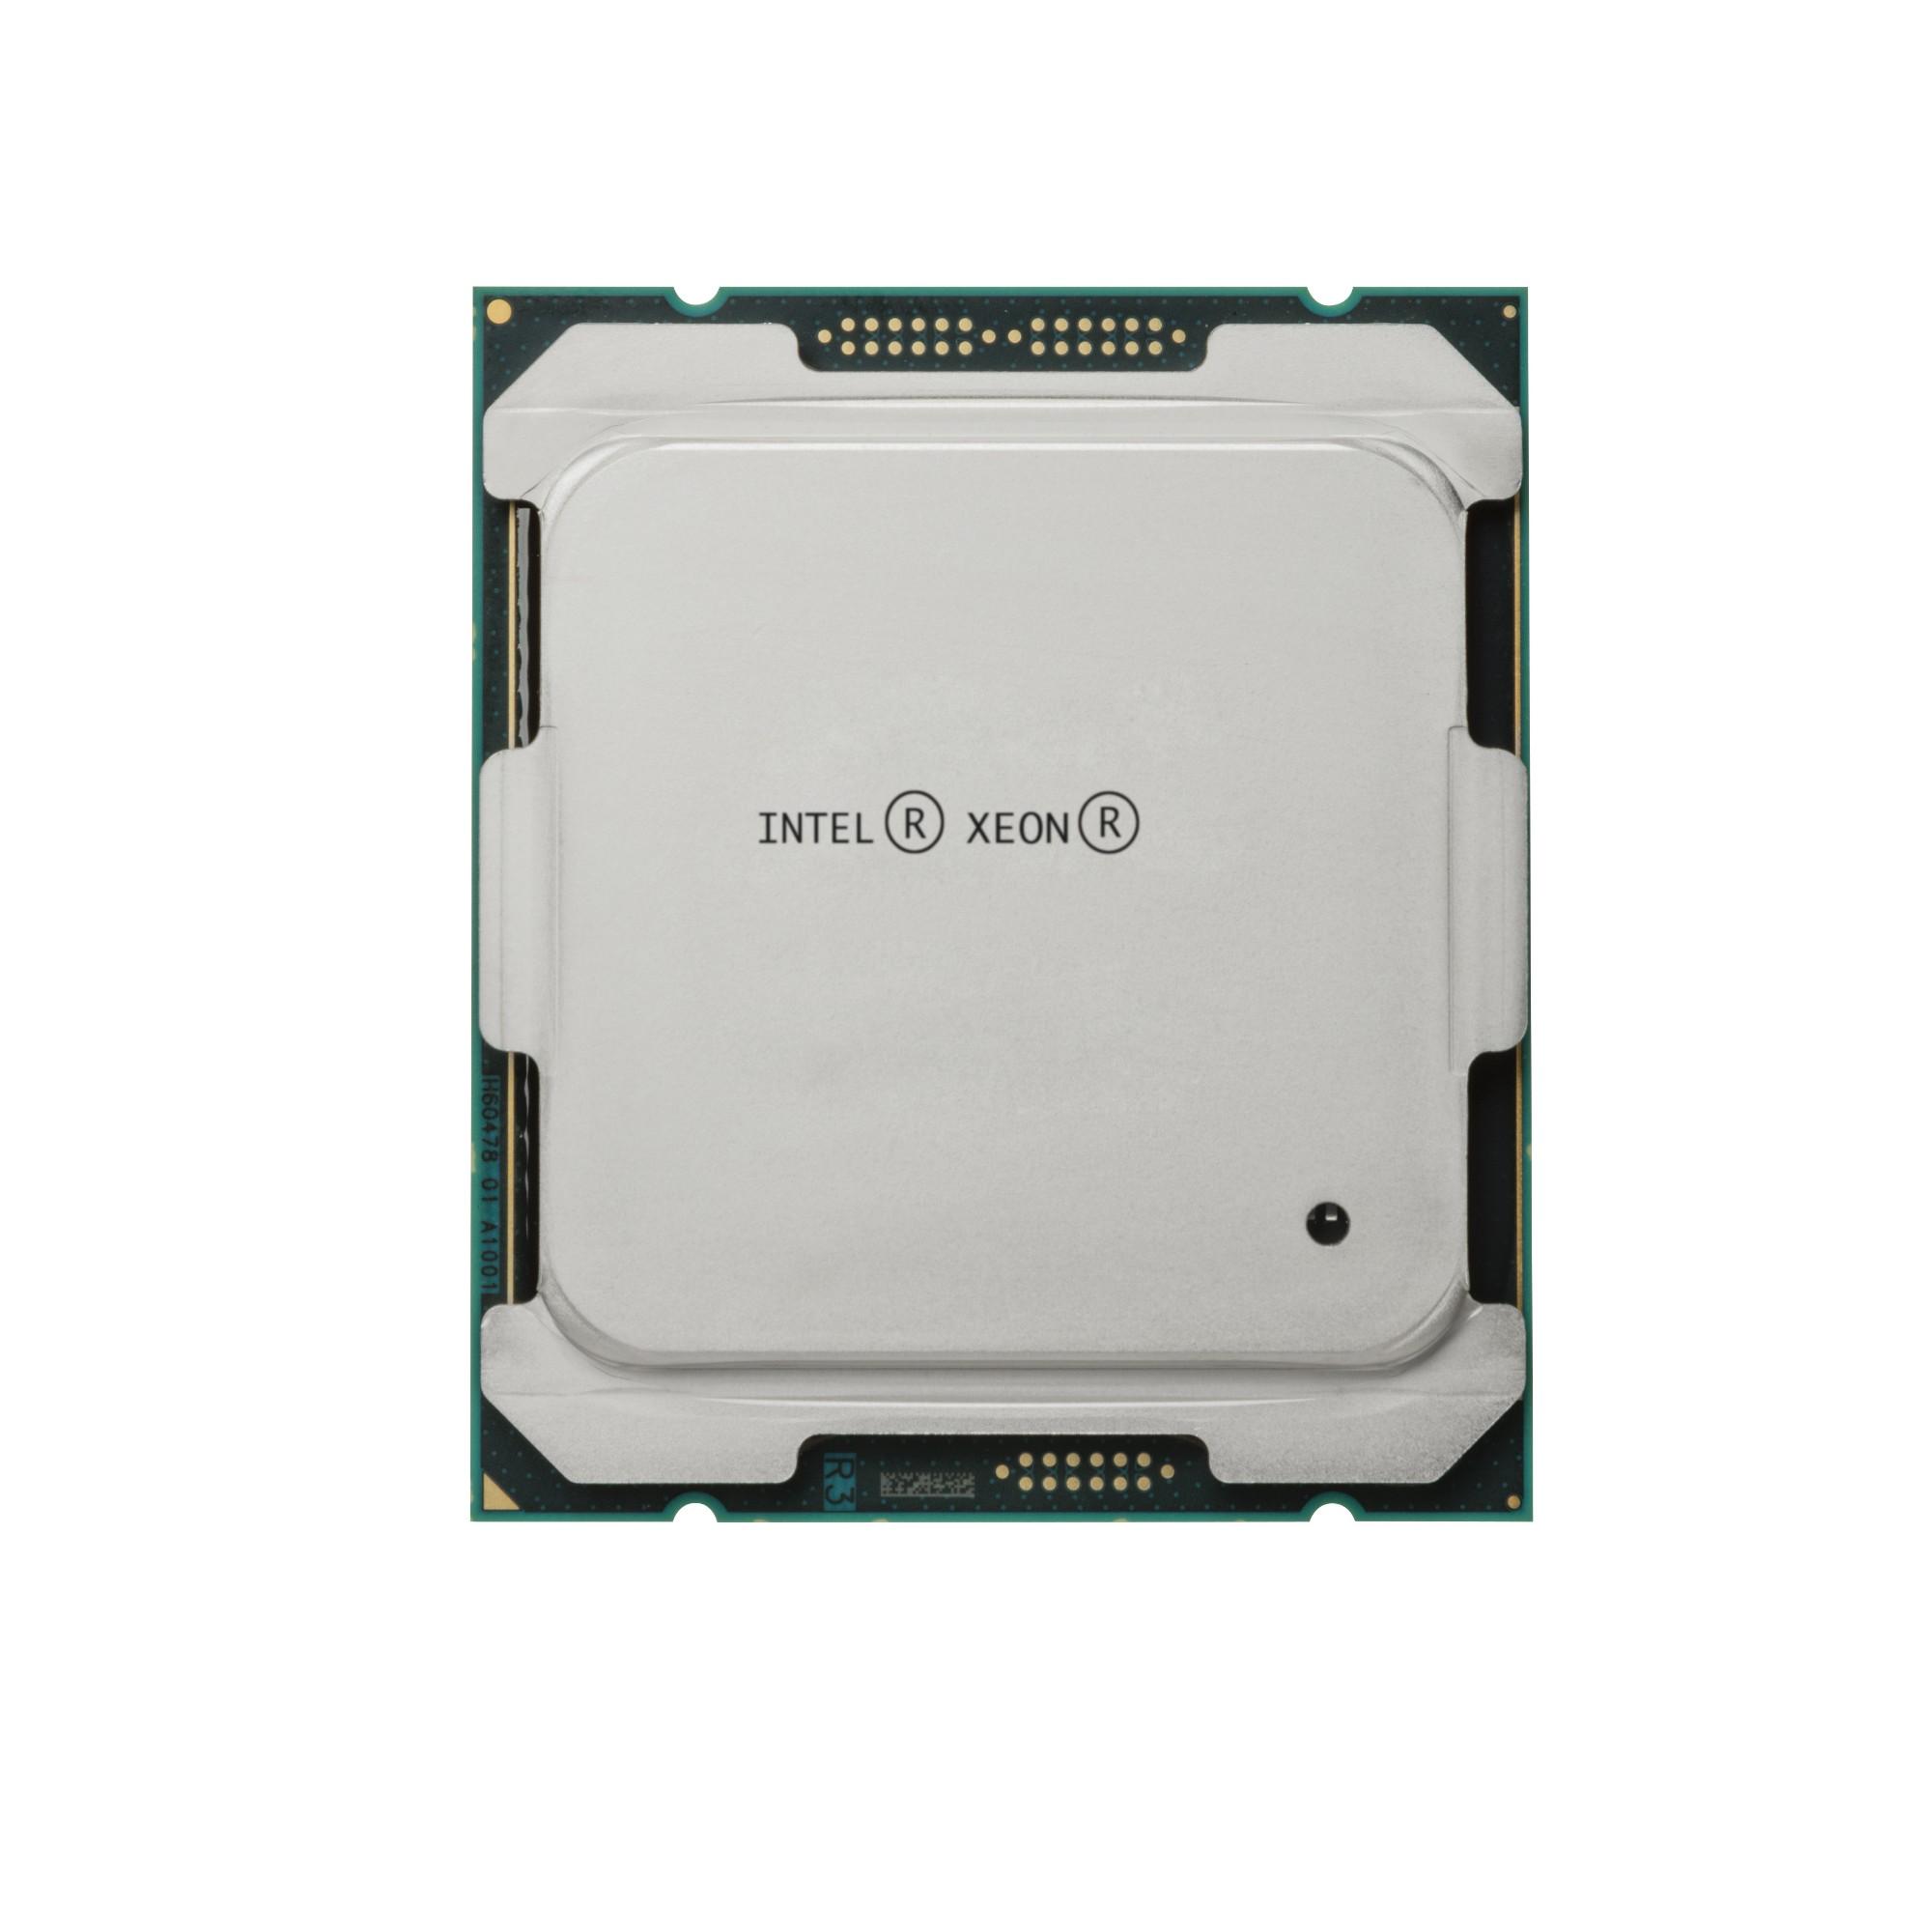 HP Xeon Z640 E5-2650v4 2.2GHz 2400MHz 12 Core 2nd CPU